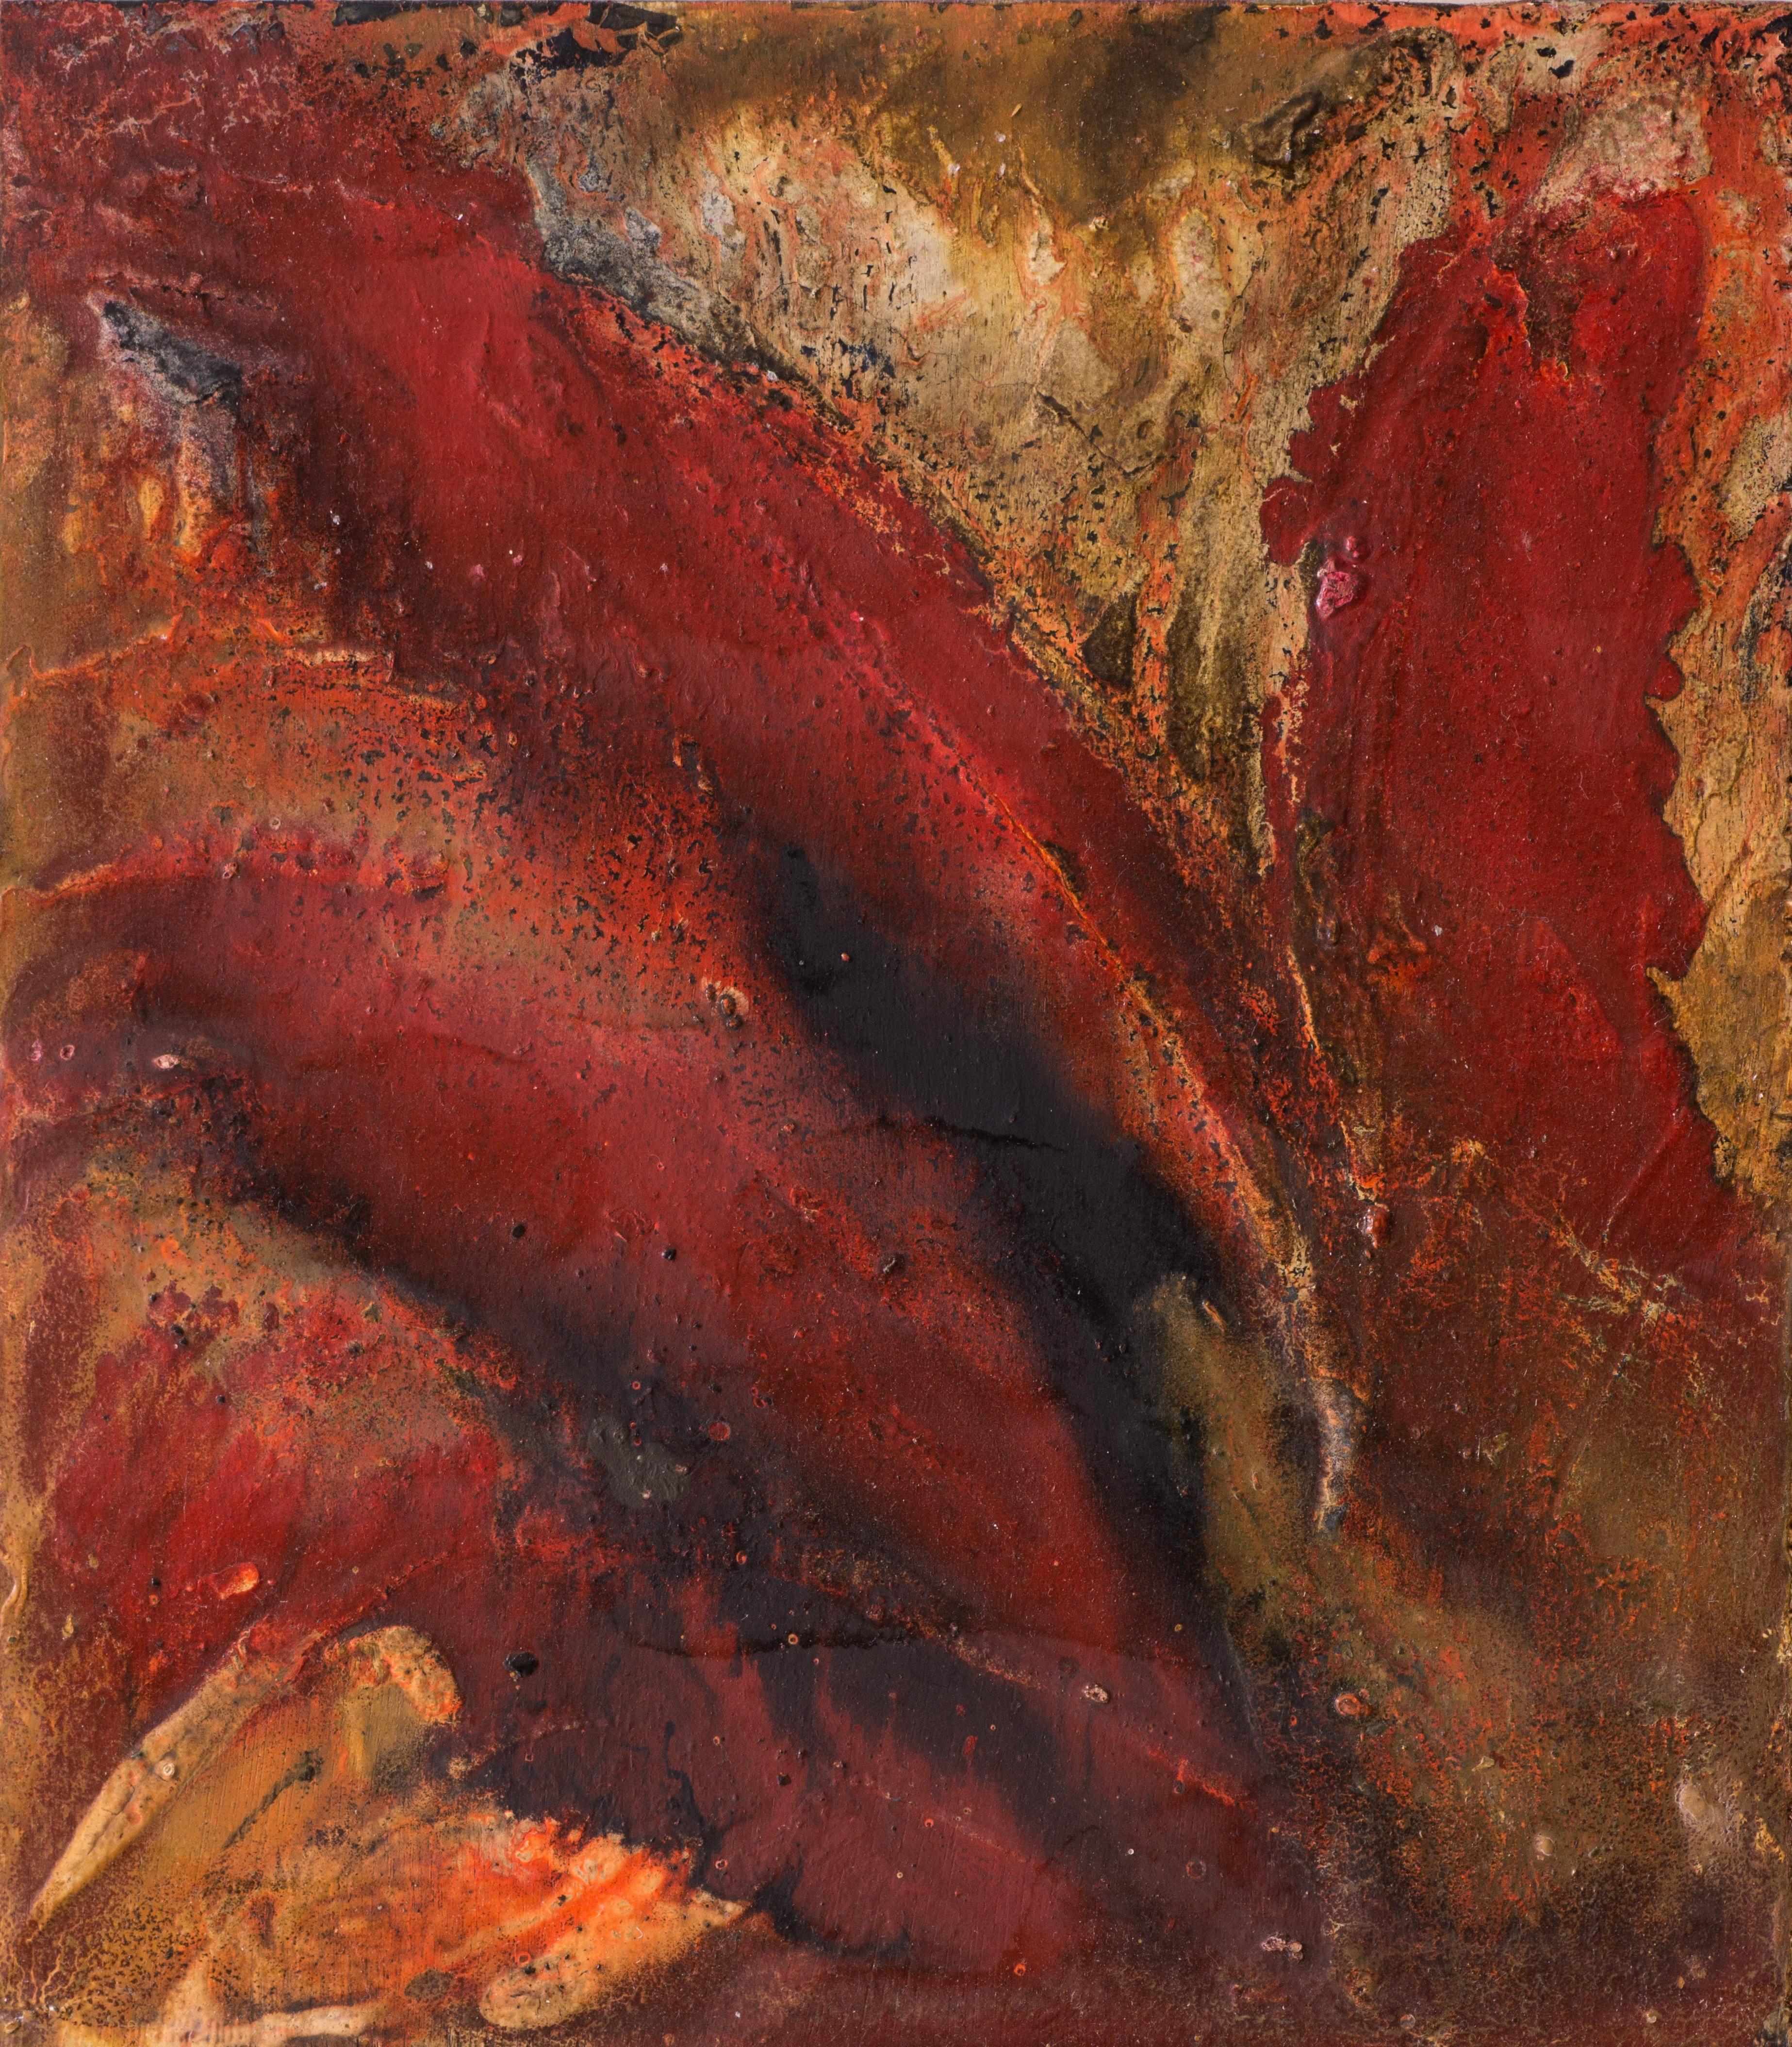 Red Petal Study 2014